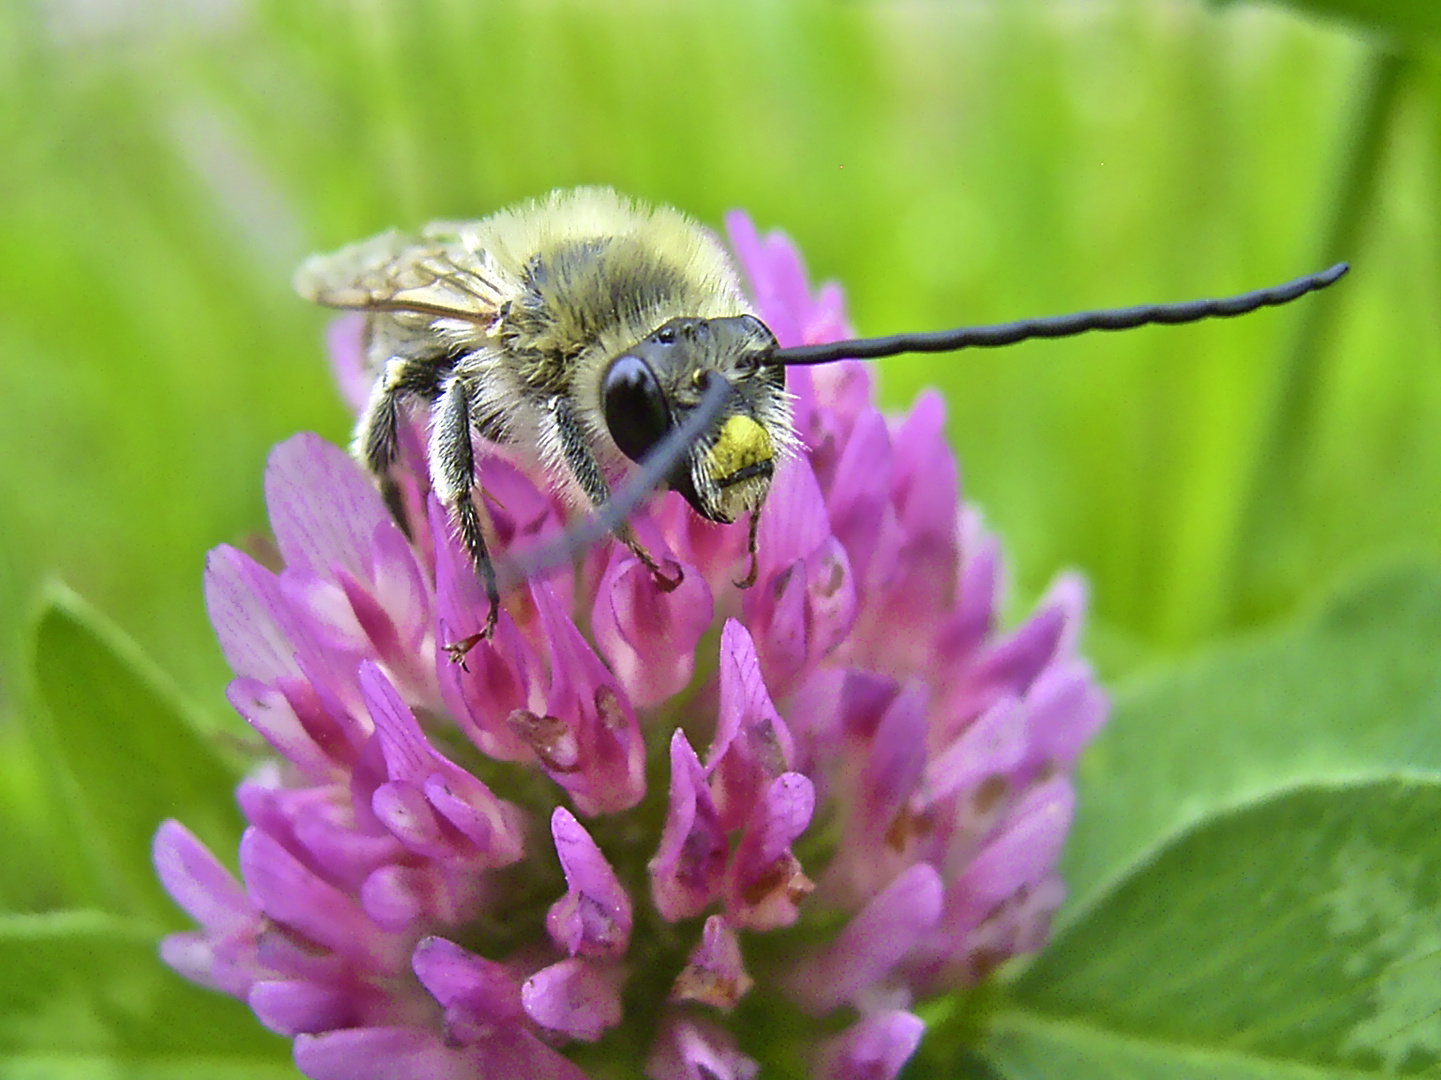 ... Langhornbienenmännchen ...